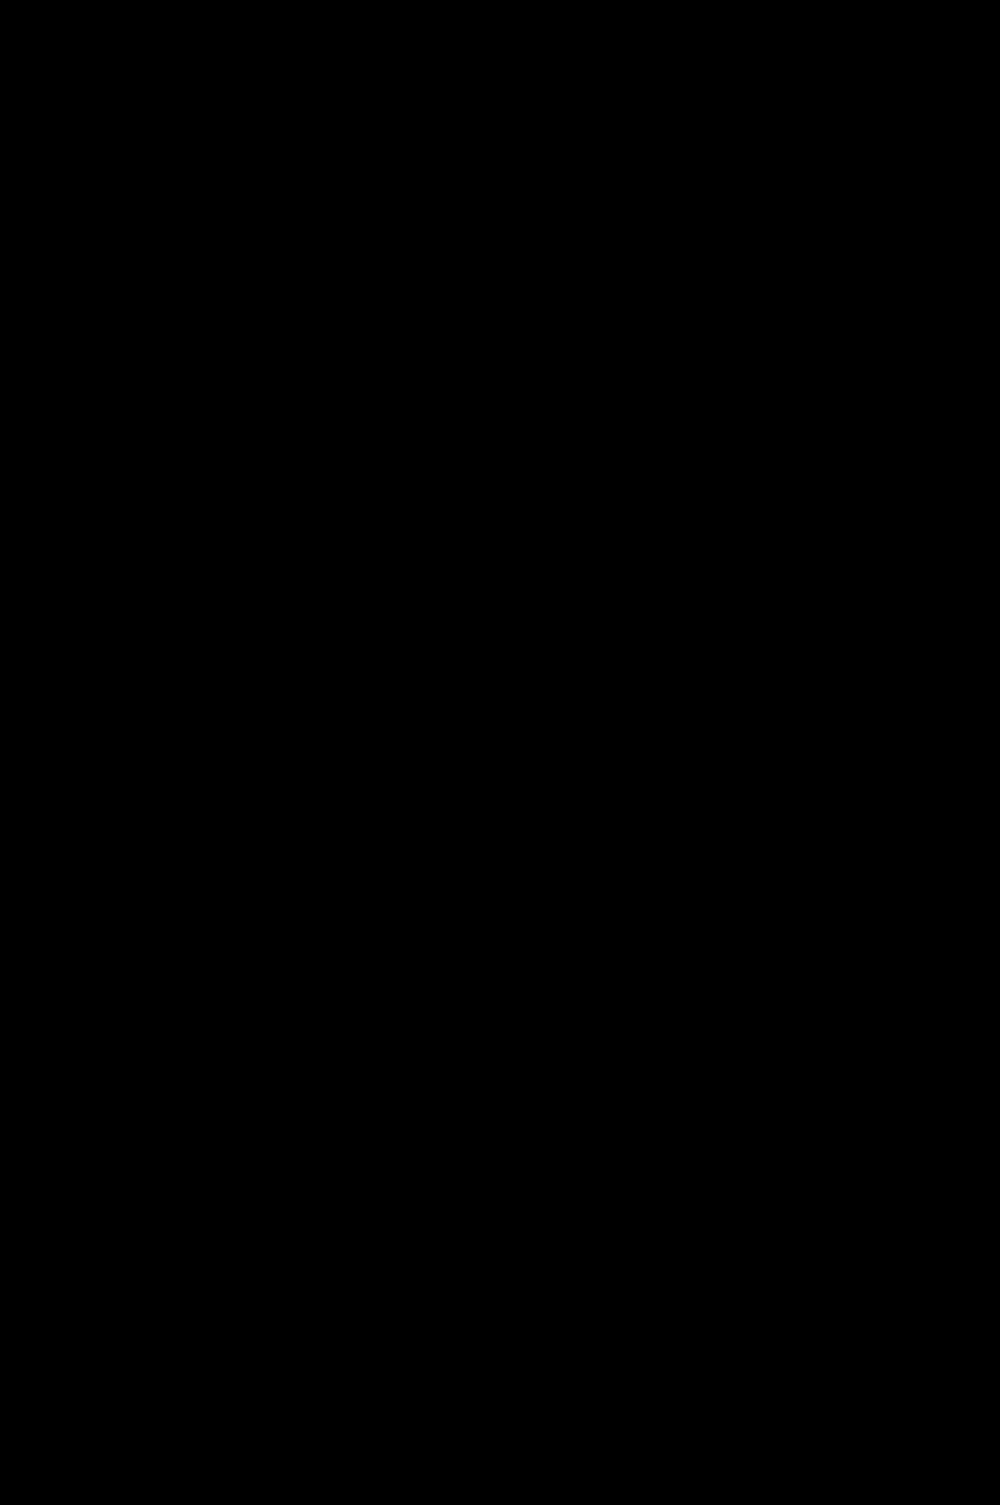 Outras Cidades Importantes  Milão  Nápoles  Turim  Palermo  Génova in addition Myriam Seurat Des Photos  Des Photos De Fond  Fond D'écran as well Radio Sensación further ご入居者・ご契約者インタビュー │「公式」さき as well Schnecke  Rote  Wegschnecke  Weichtiere. on 277 html